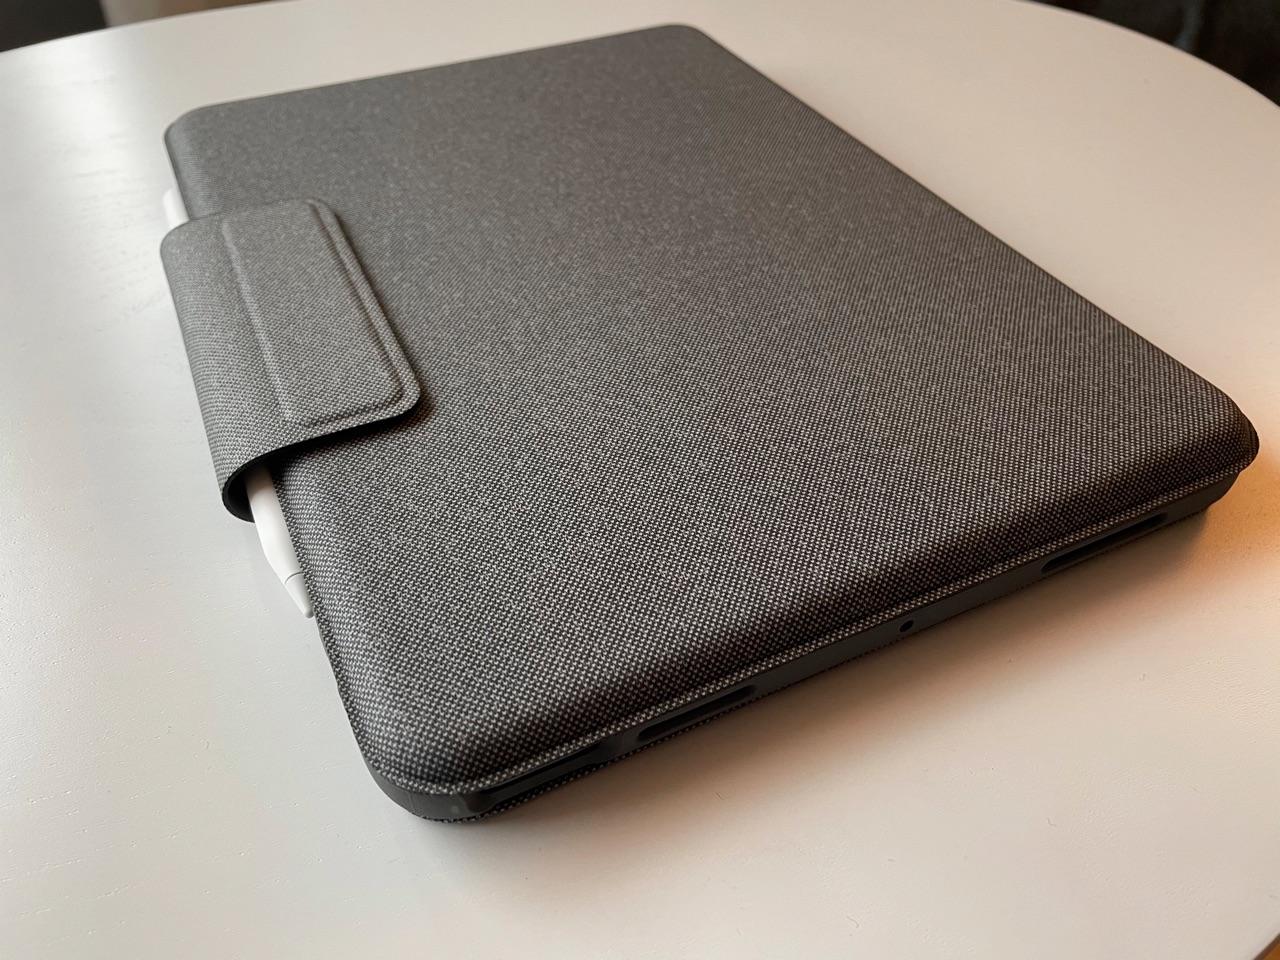 Buitenkant Logitech Folio Touch.